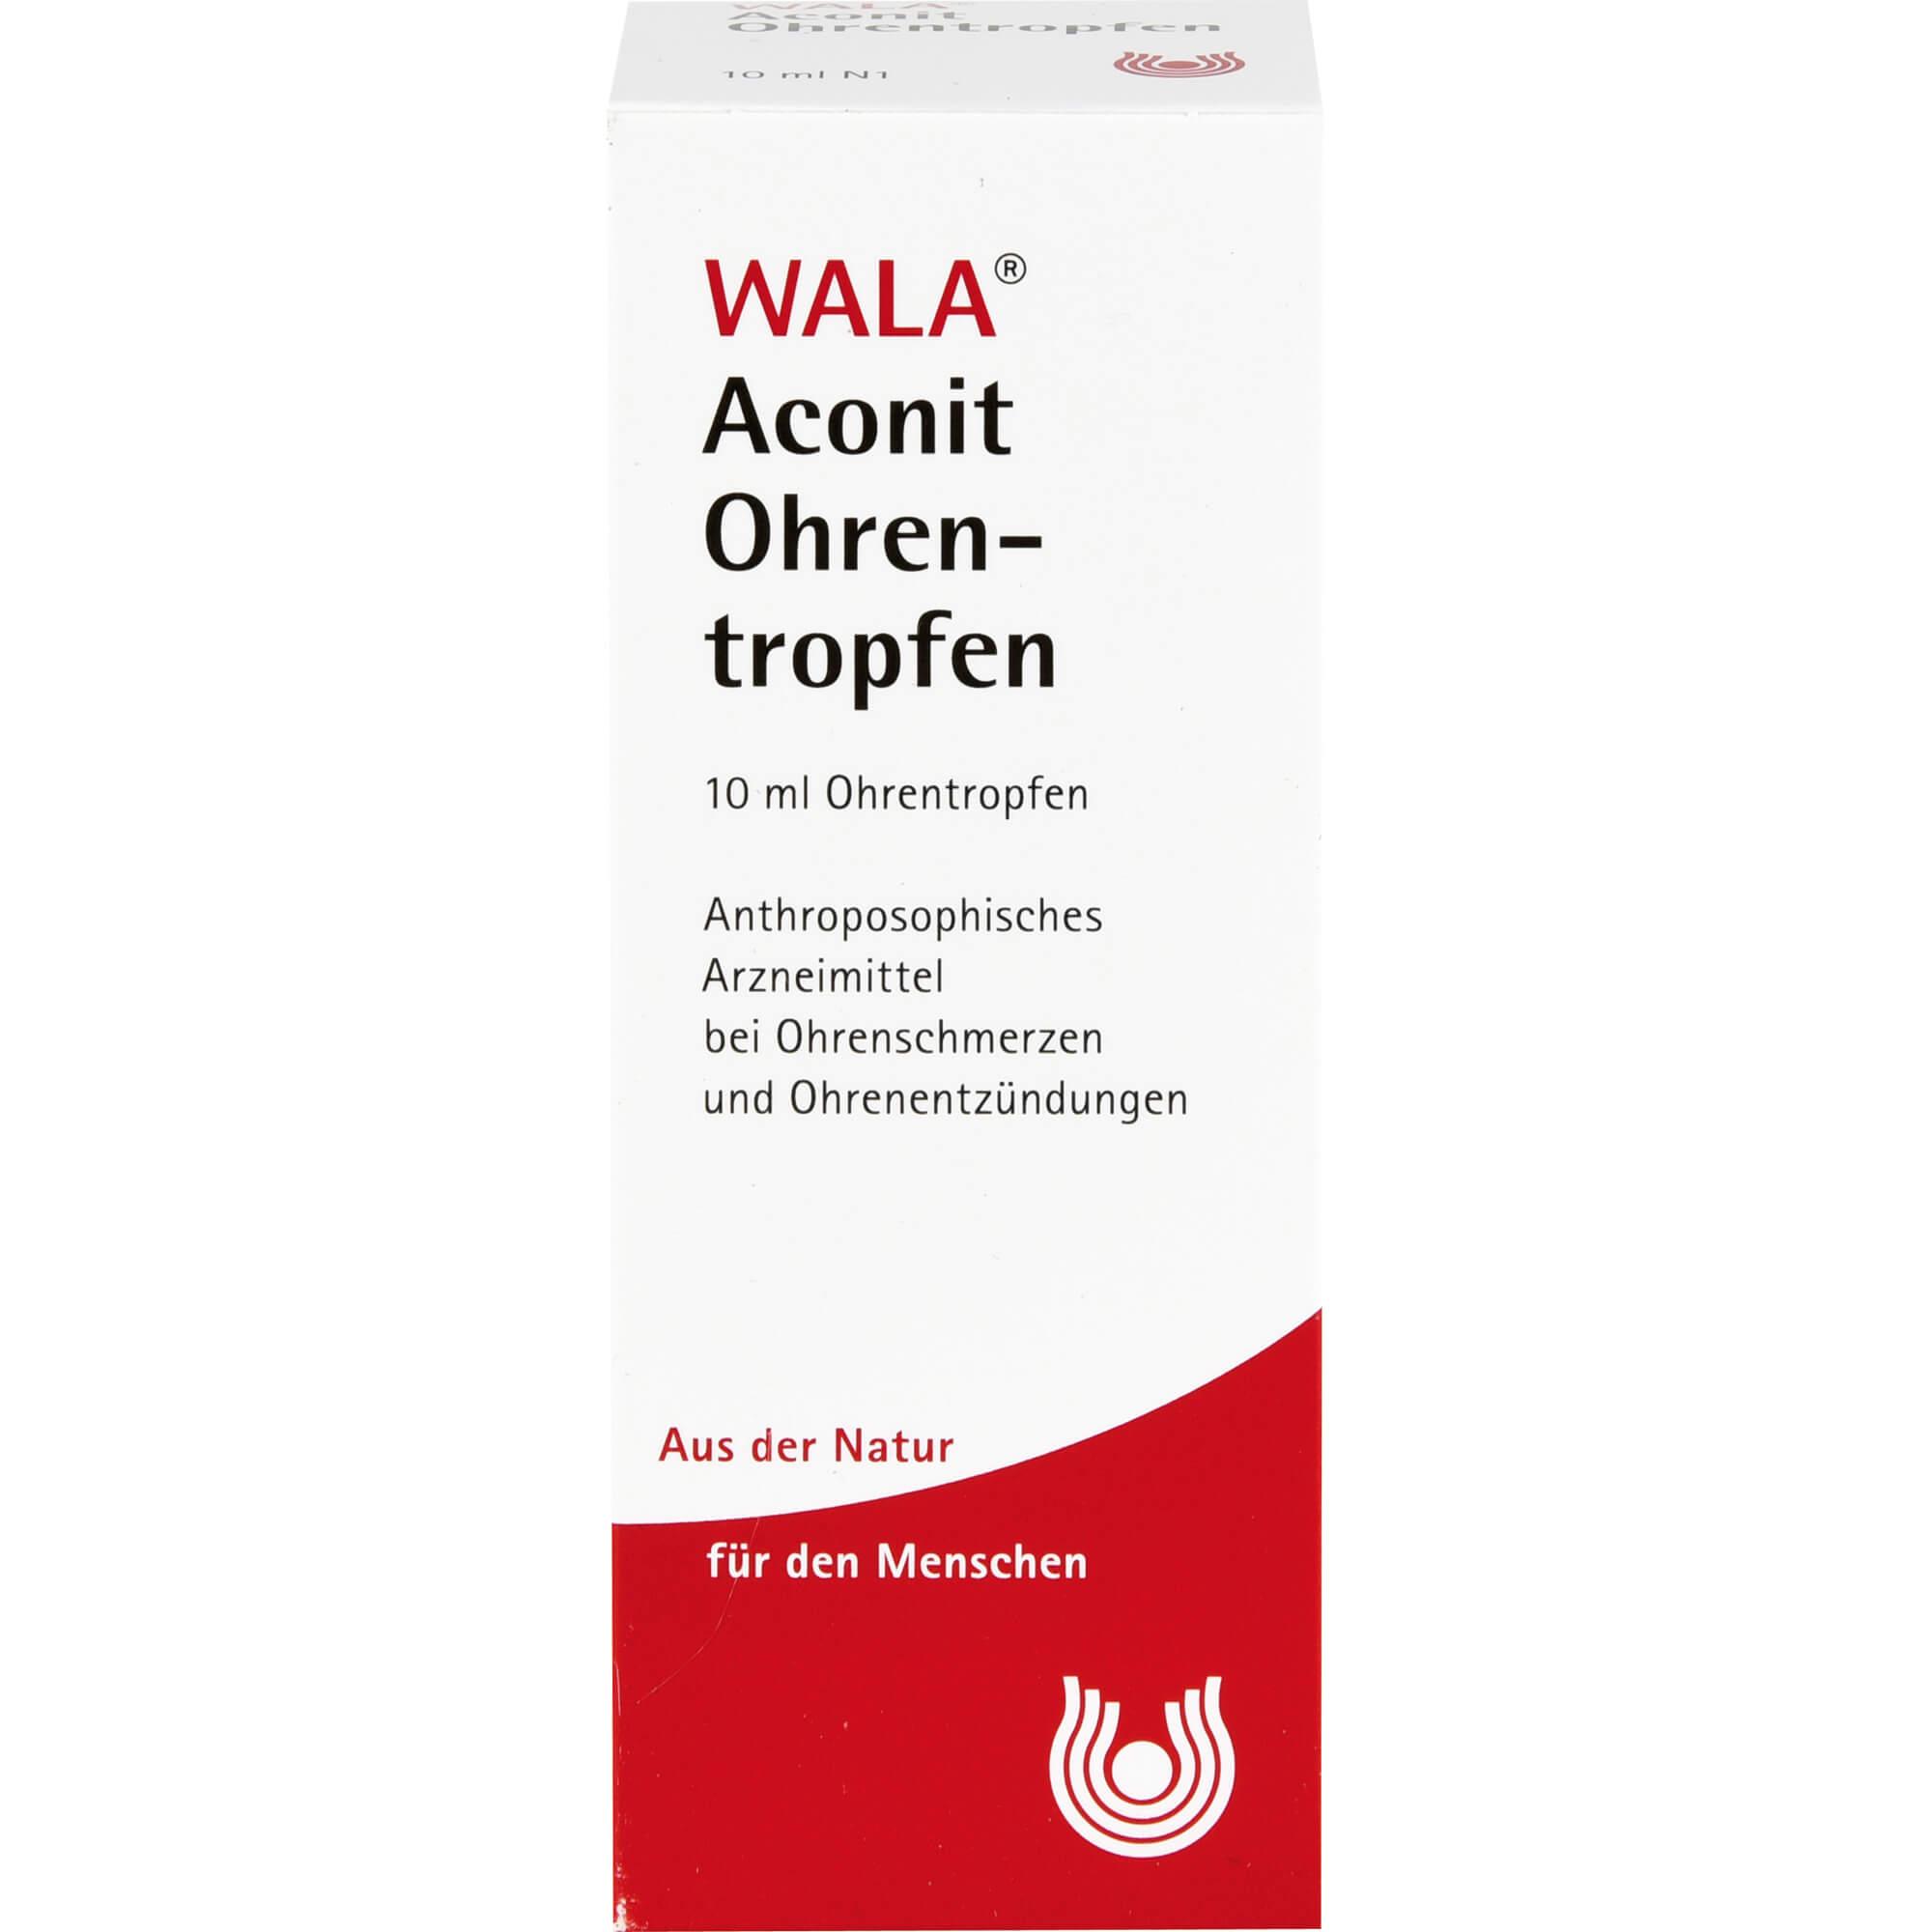 ACONIT-Ohrentropfen